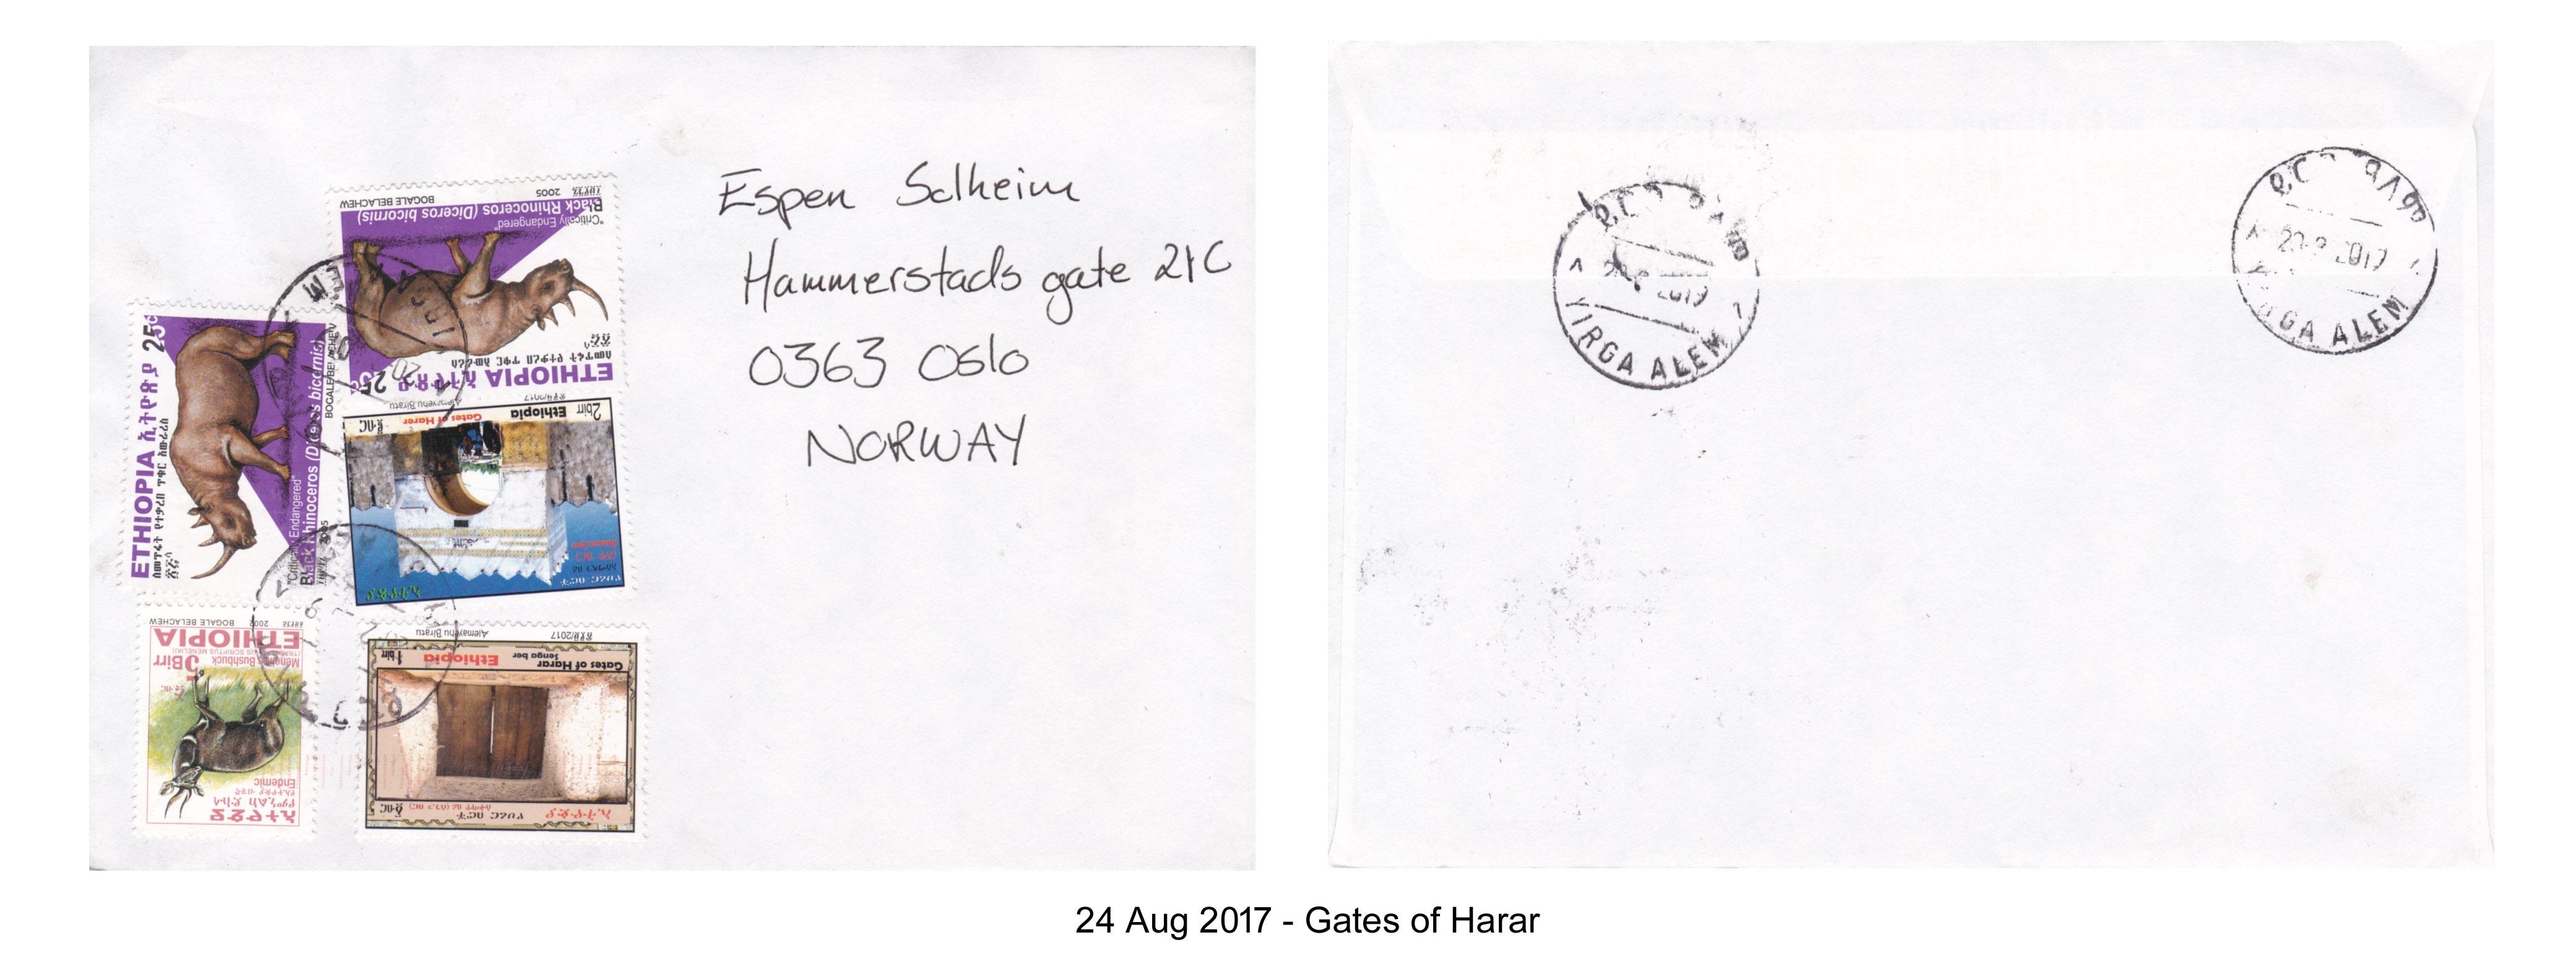 20170824 - Gates of Harar